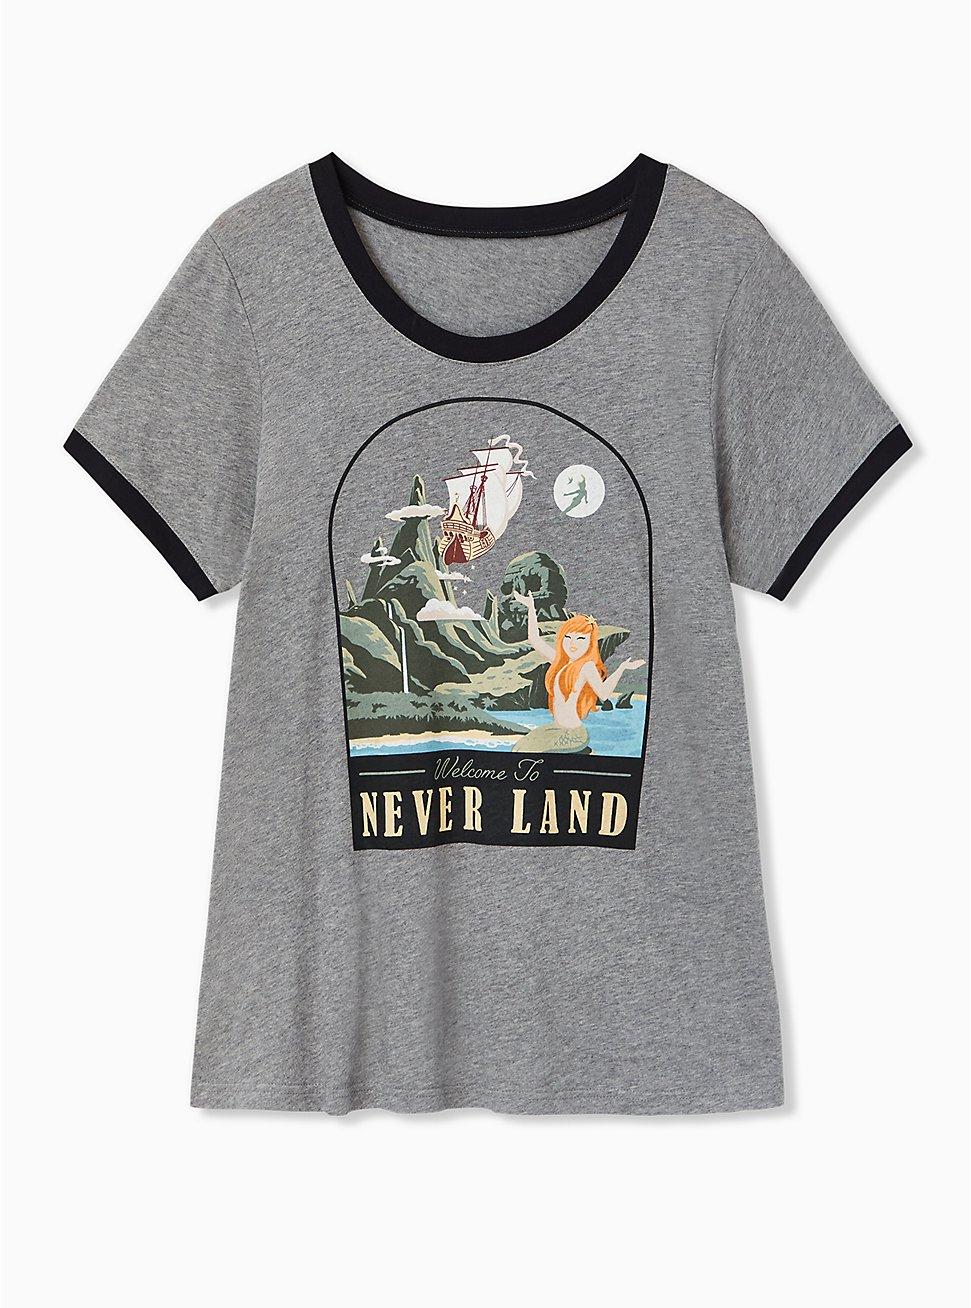 Plus Size Disney Peter Pan Neverland Skull Island Heather Grey Ringer Top, LIGHT GREY HEATHER, hi-res